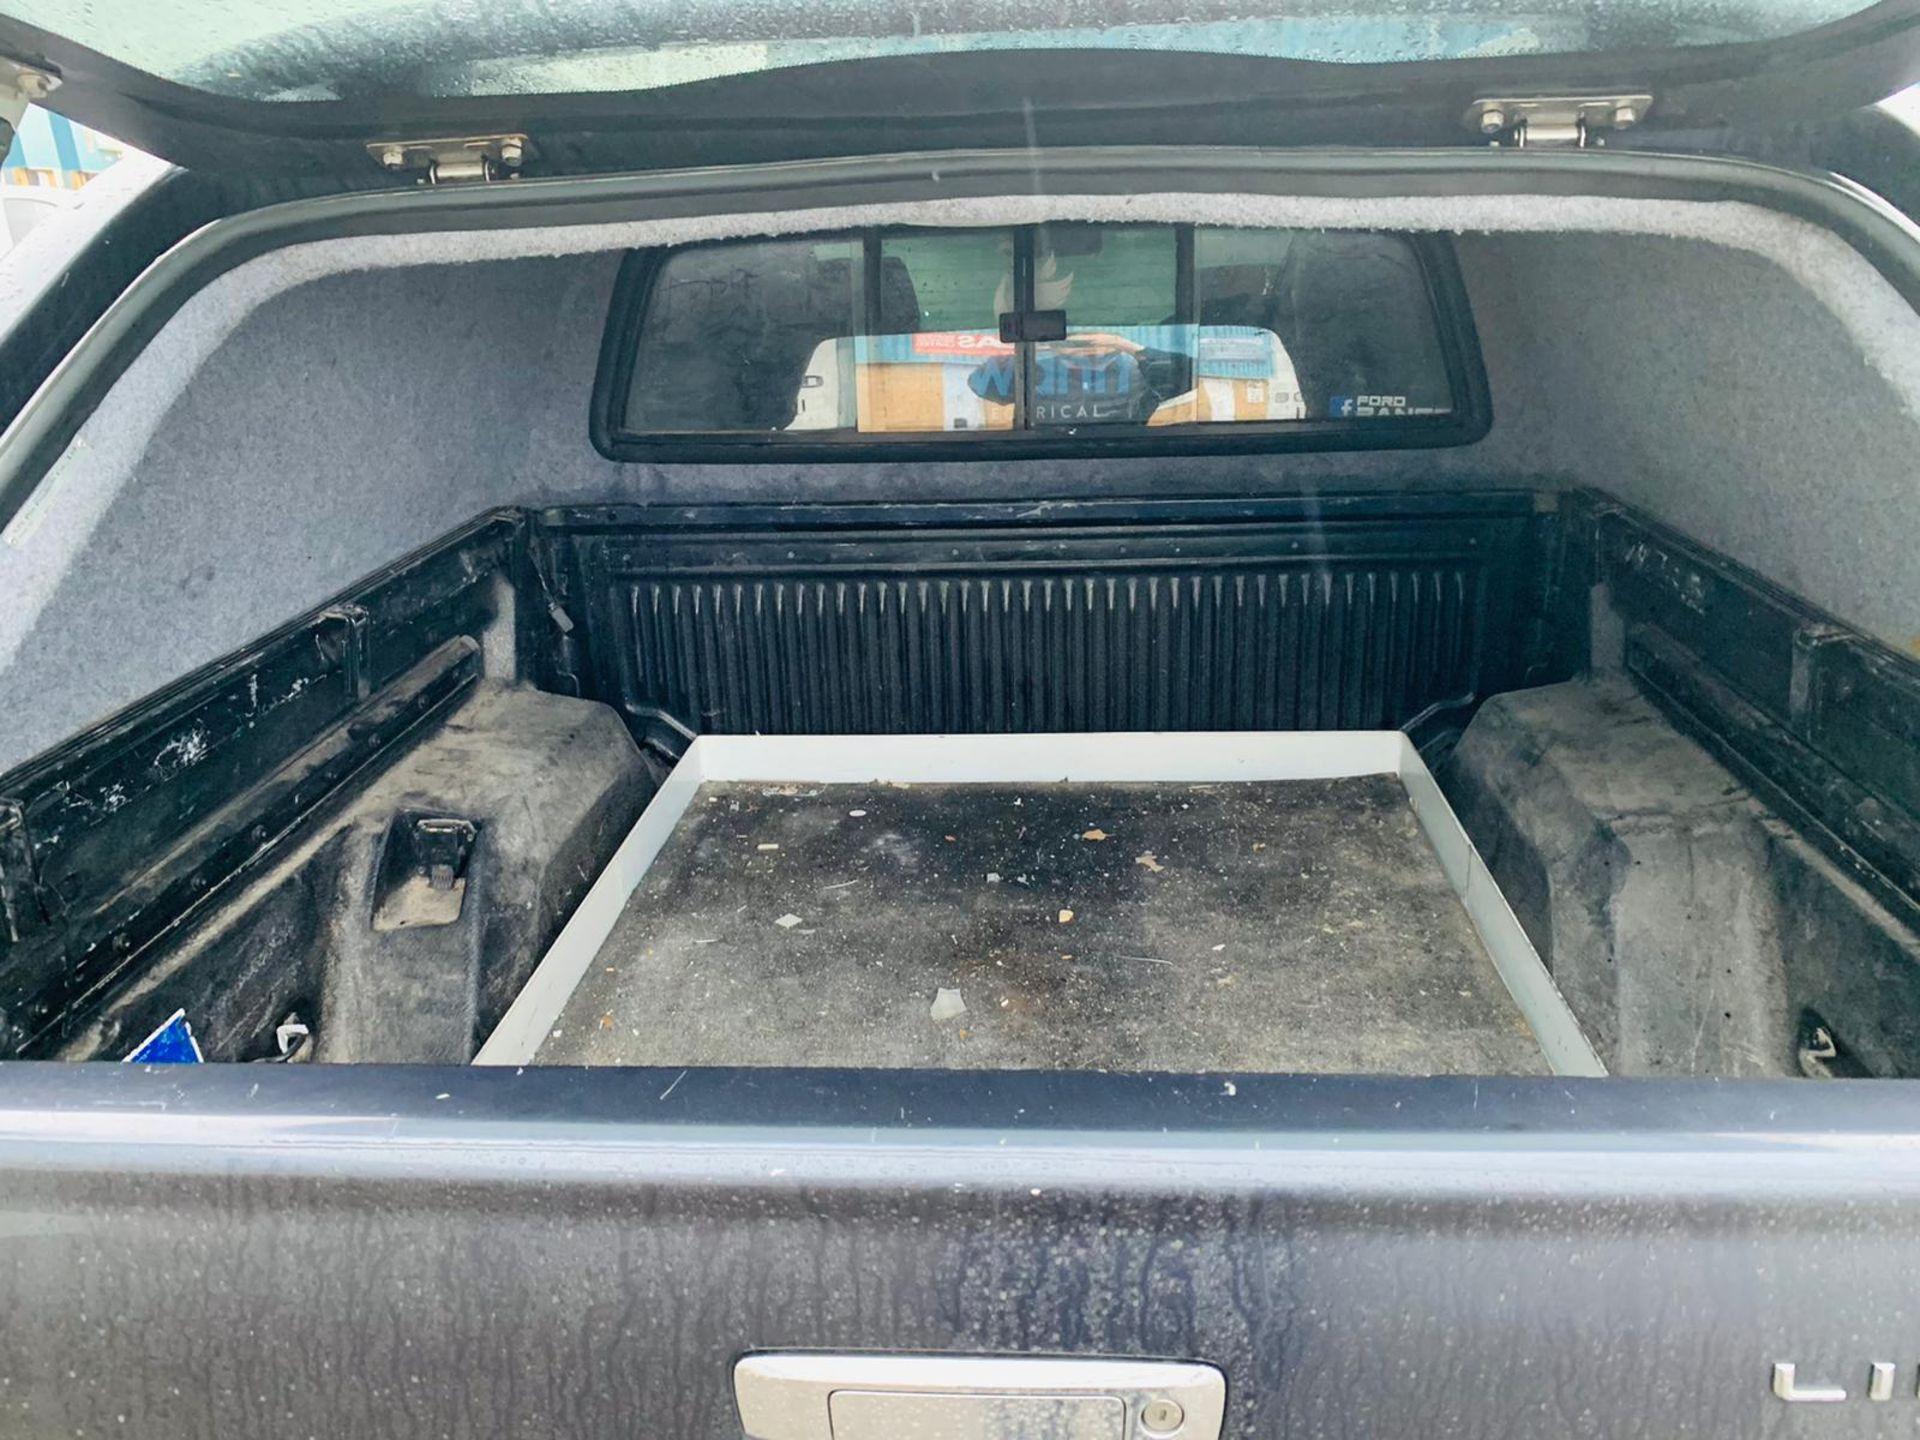 (RESERVE MET) Ford Ranger 2.2 TDCI LTD 4x4 Double Cab 2017 17 Reg - Reversing Cam -Leather - Sat Nav - Image 12 of 32